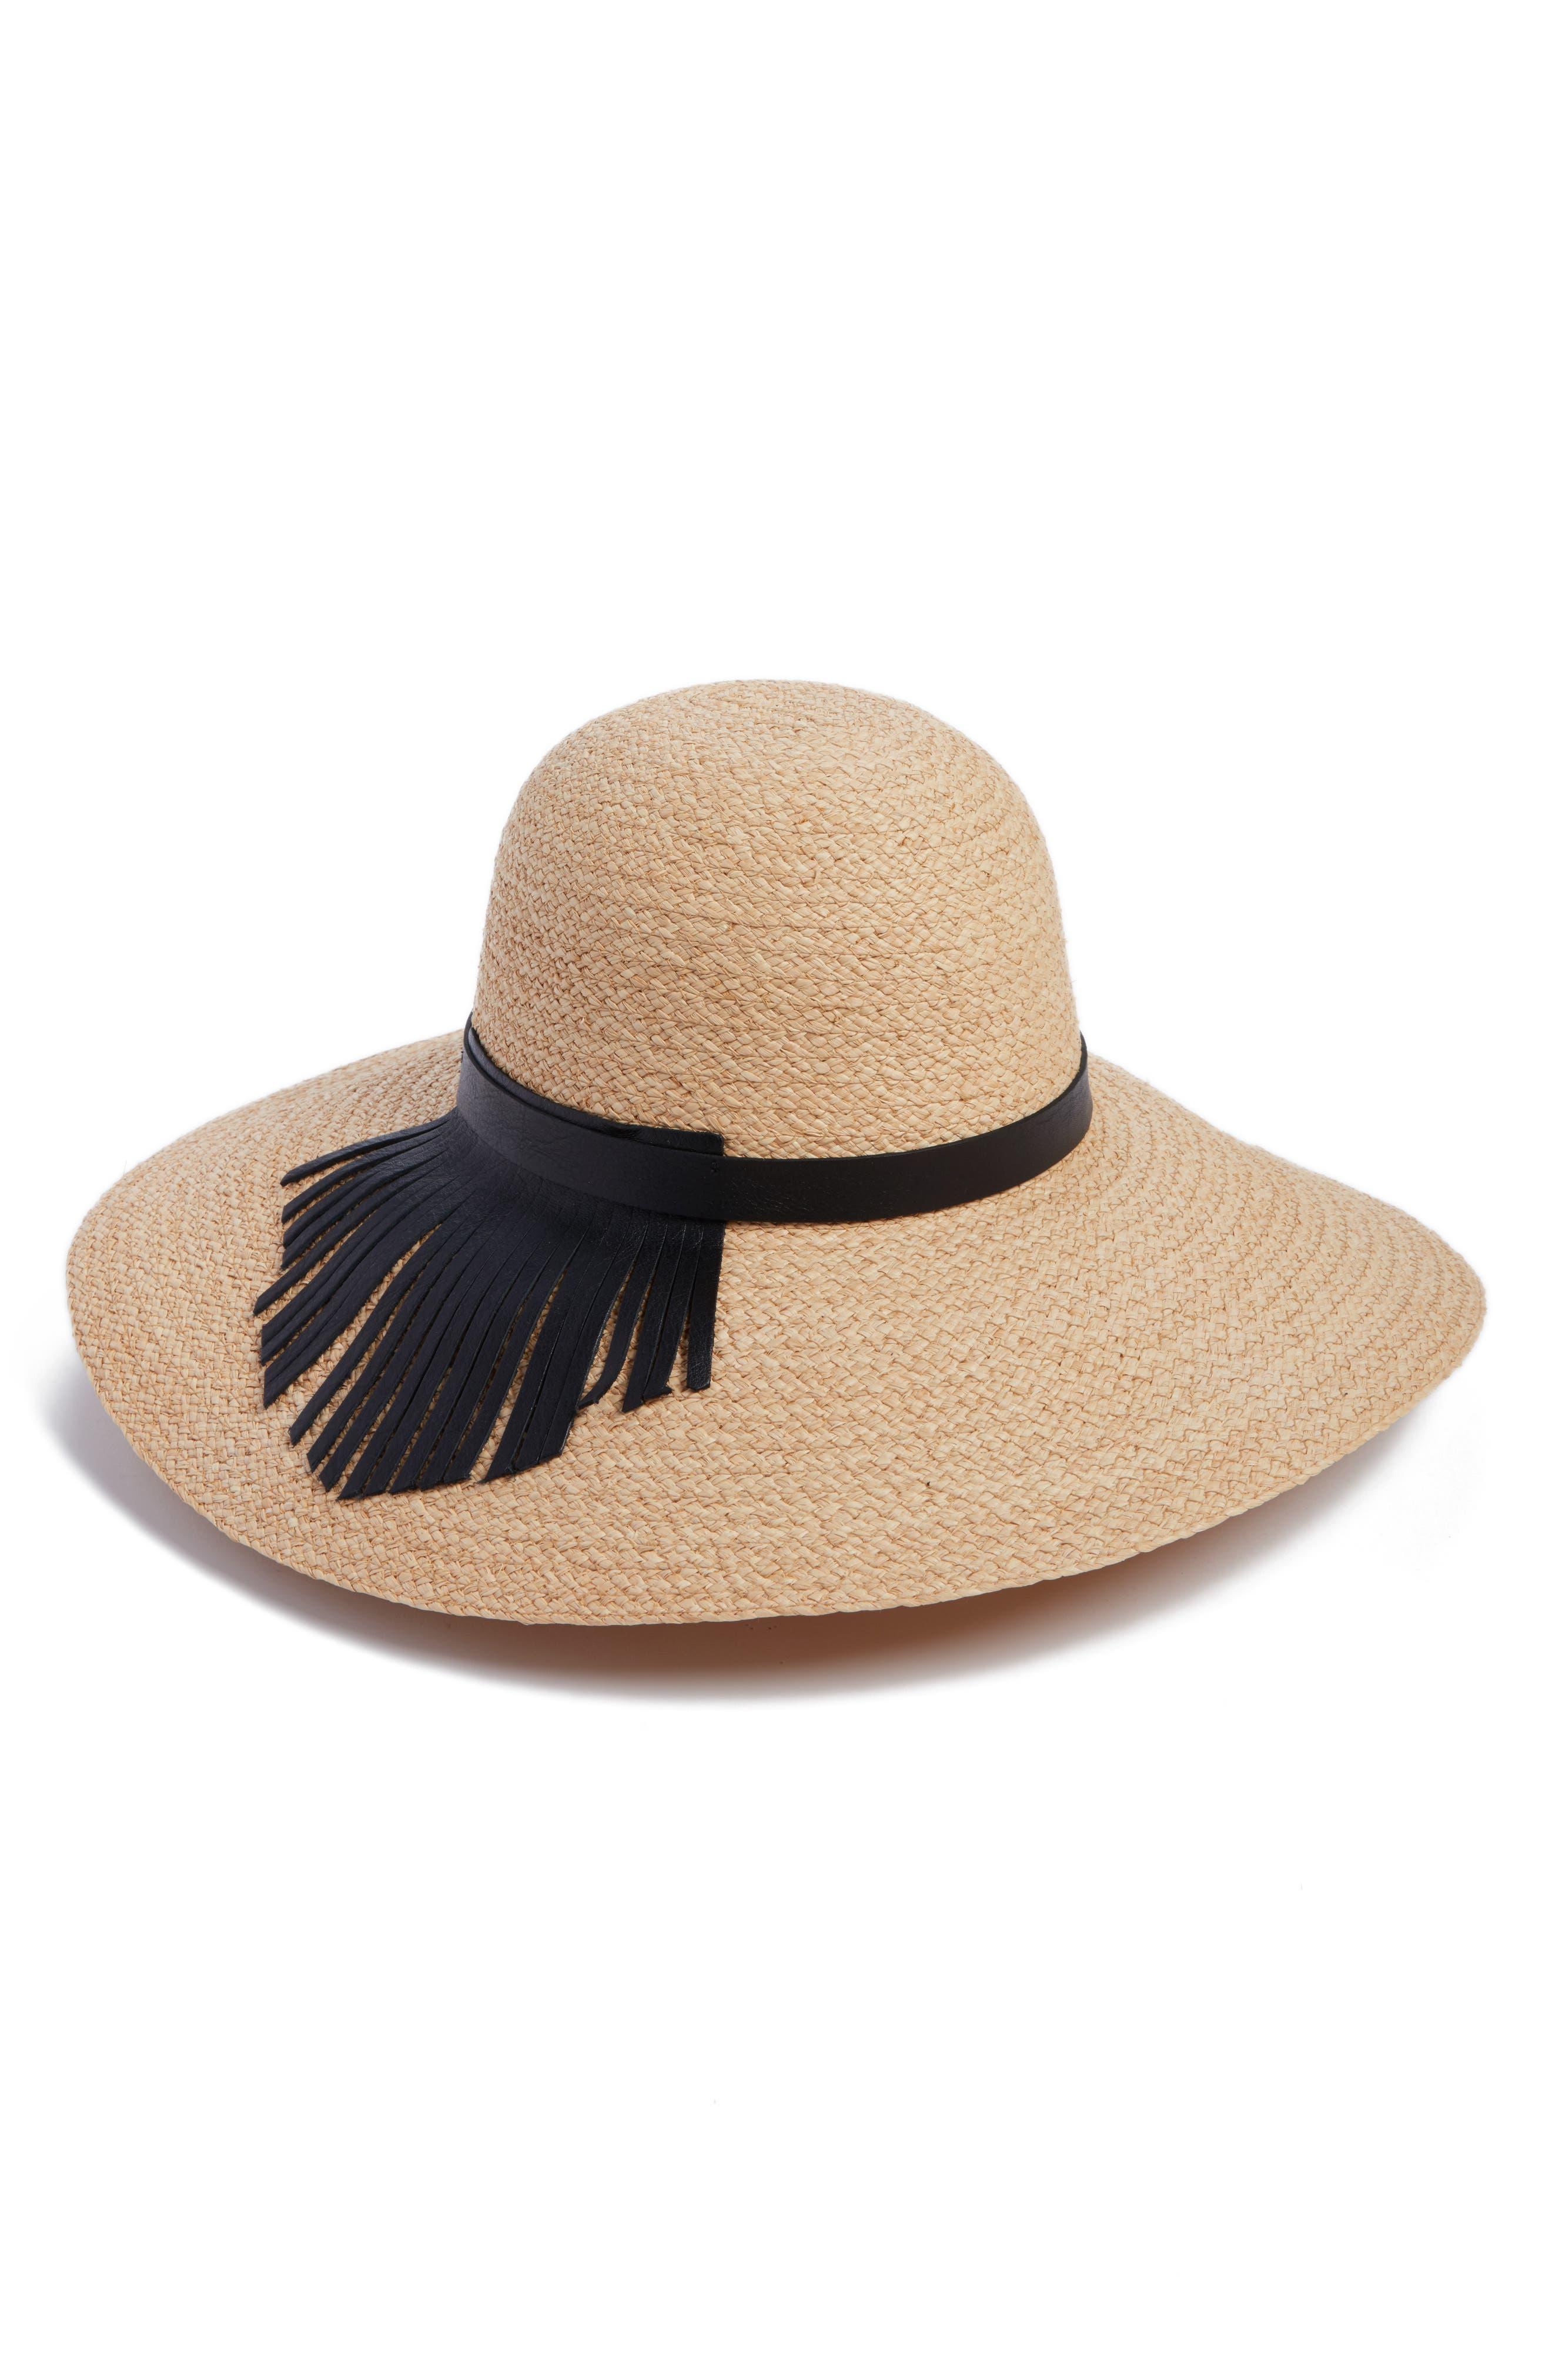 Helen Kaminski Nereda Wide Brim Raffia Straw Hat